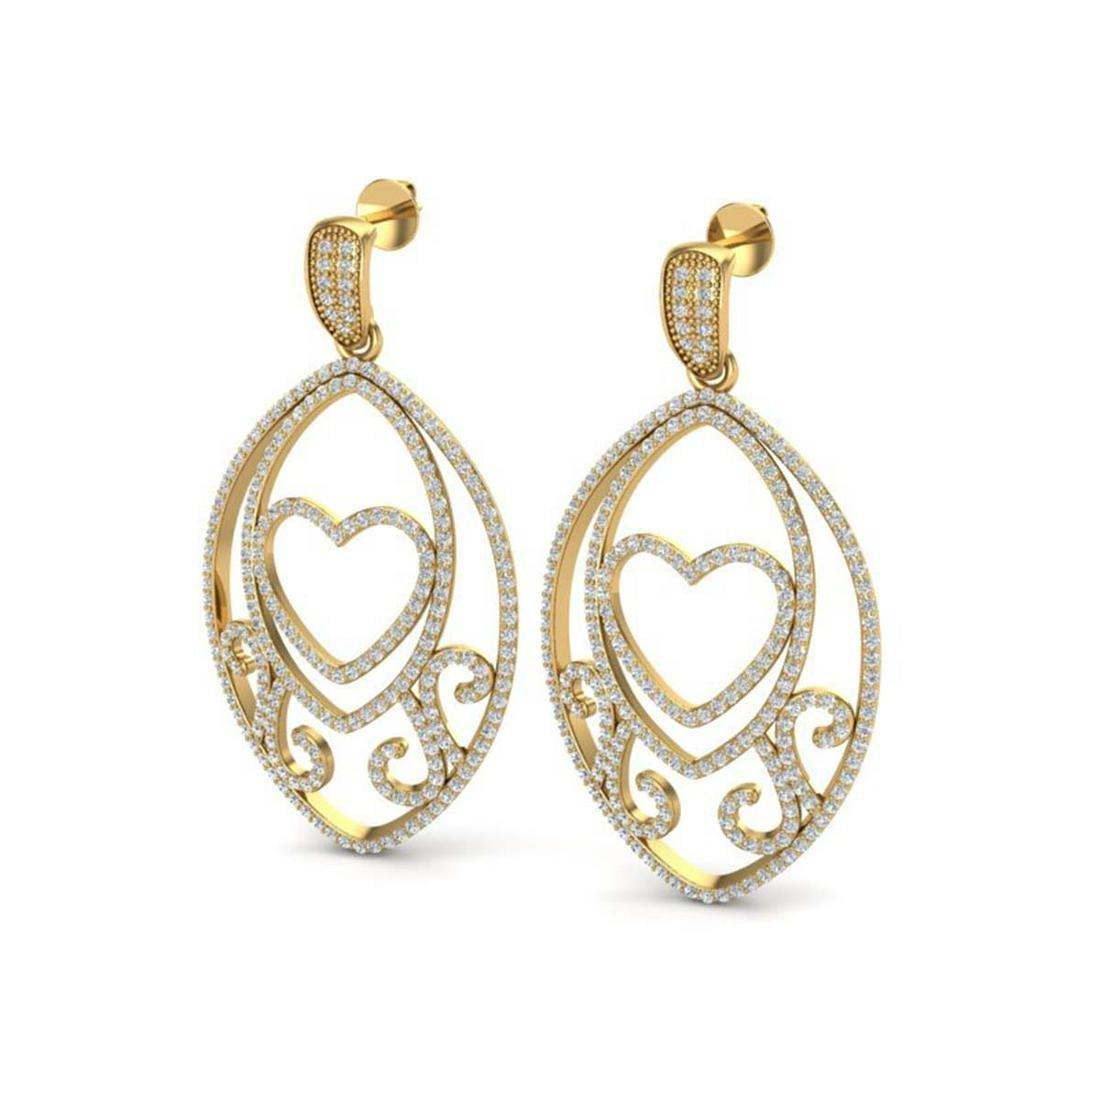 3.20 ctw VS/SI Diamond Heart Earrings 18K Yellow Gold -